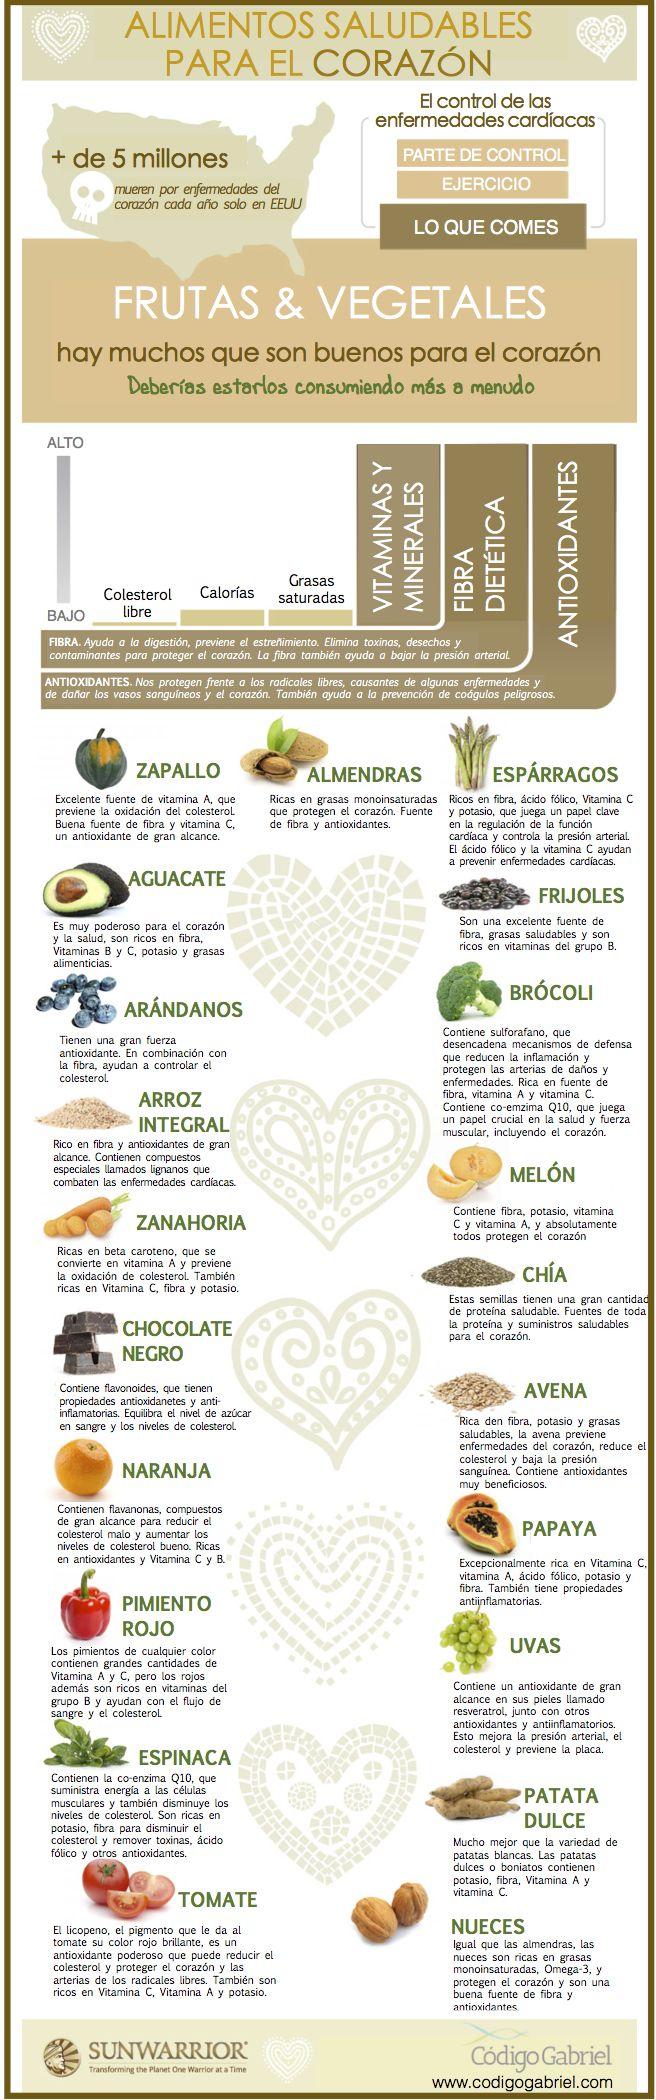 Alimentos que cuidan tu corazón #salud http://ht.ly/oA1Qh